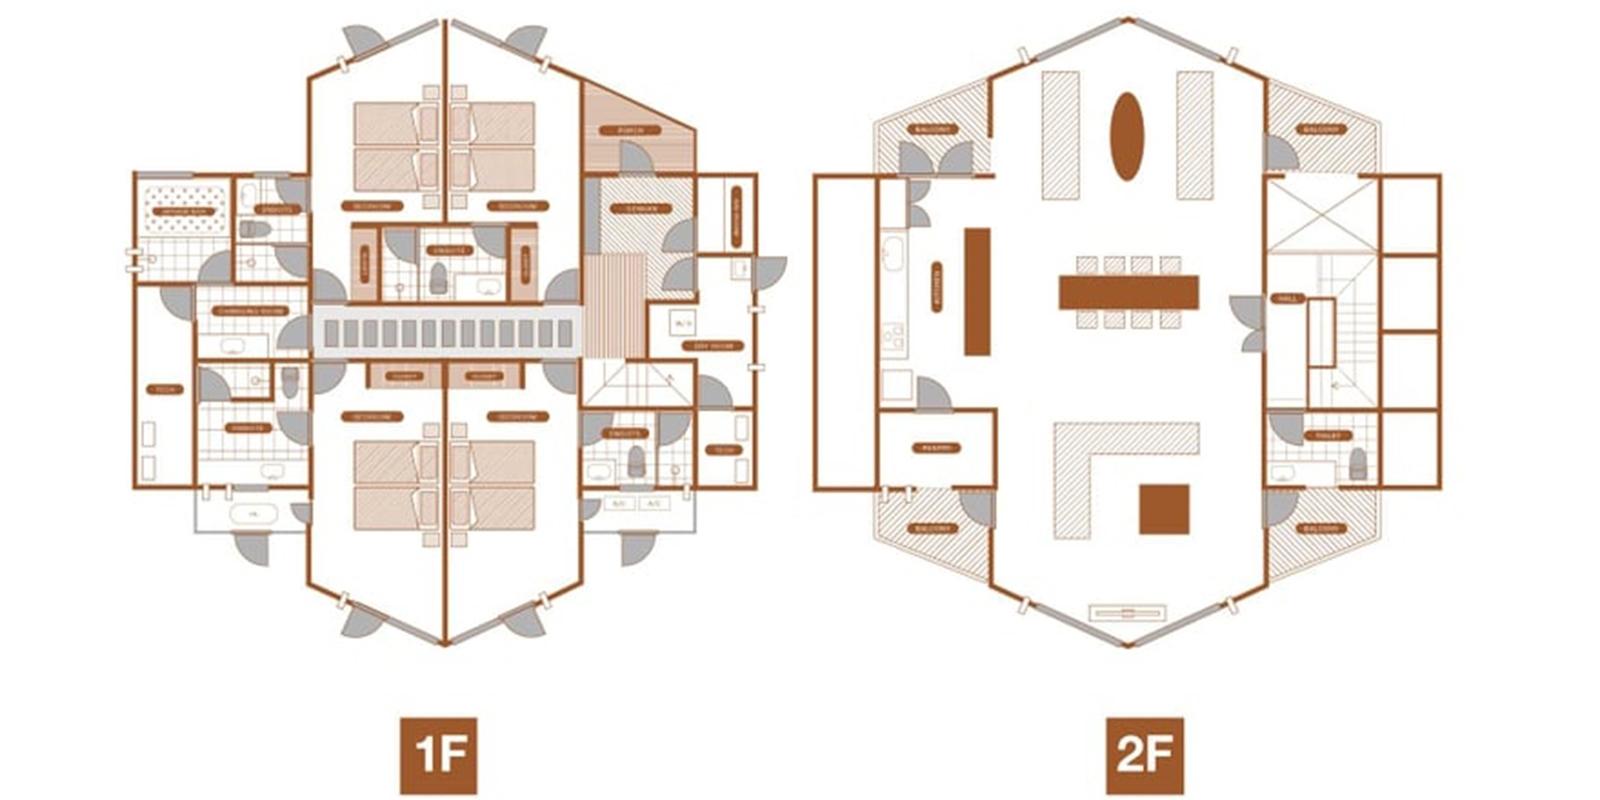 The Orchards Niseko Zakuro Floor Plan | St Moritz, Niseko | Ministry of Chalets